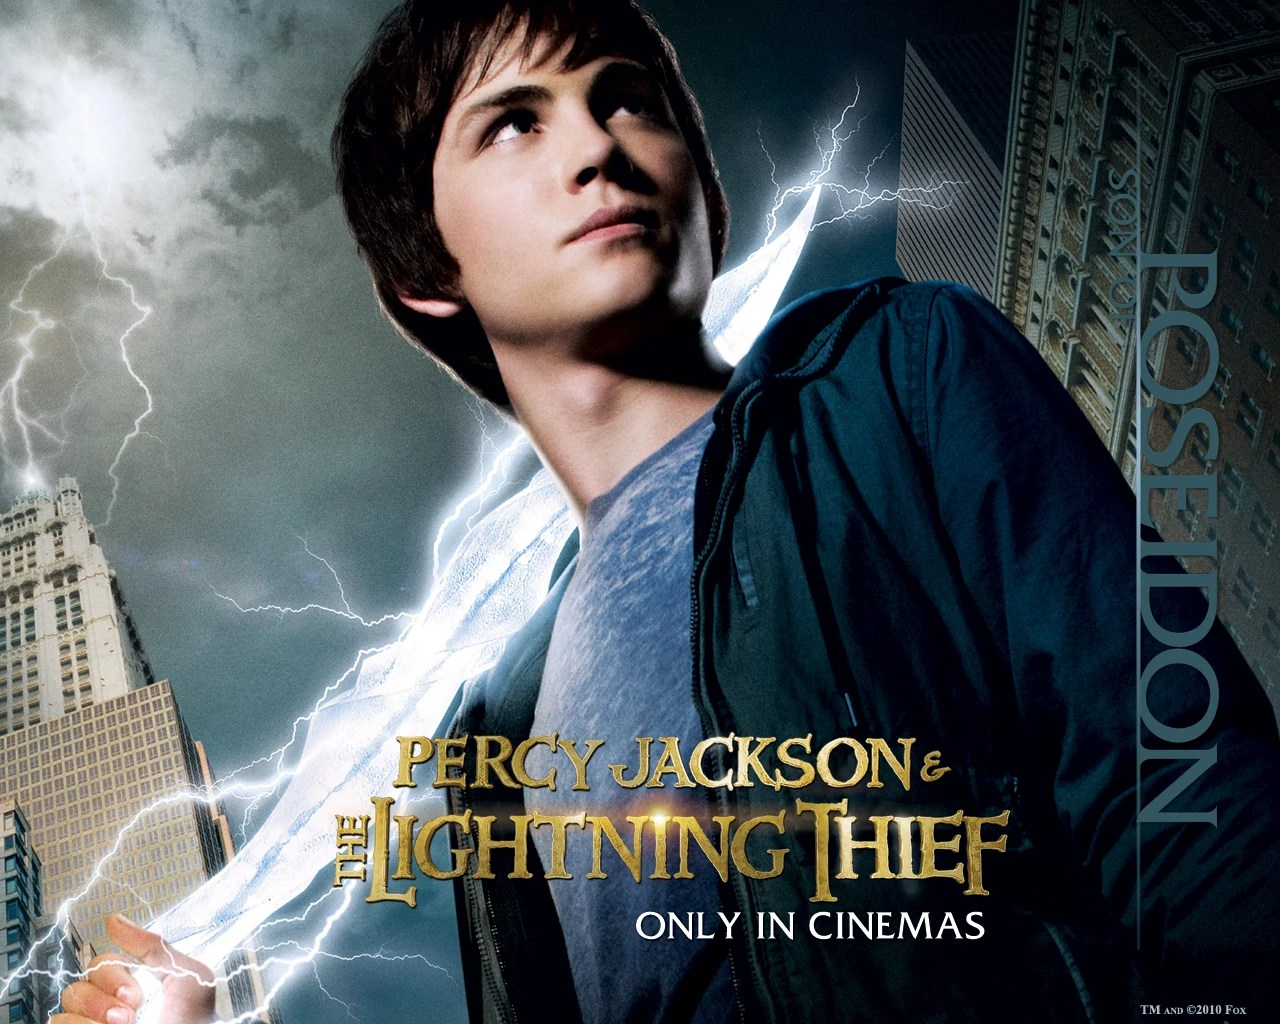 Percy Jackson Character